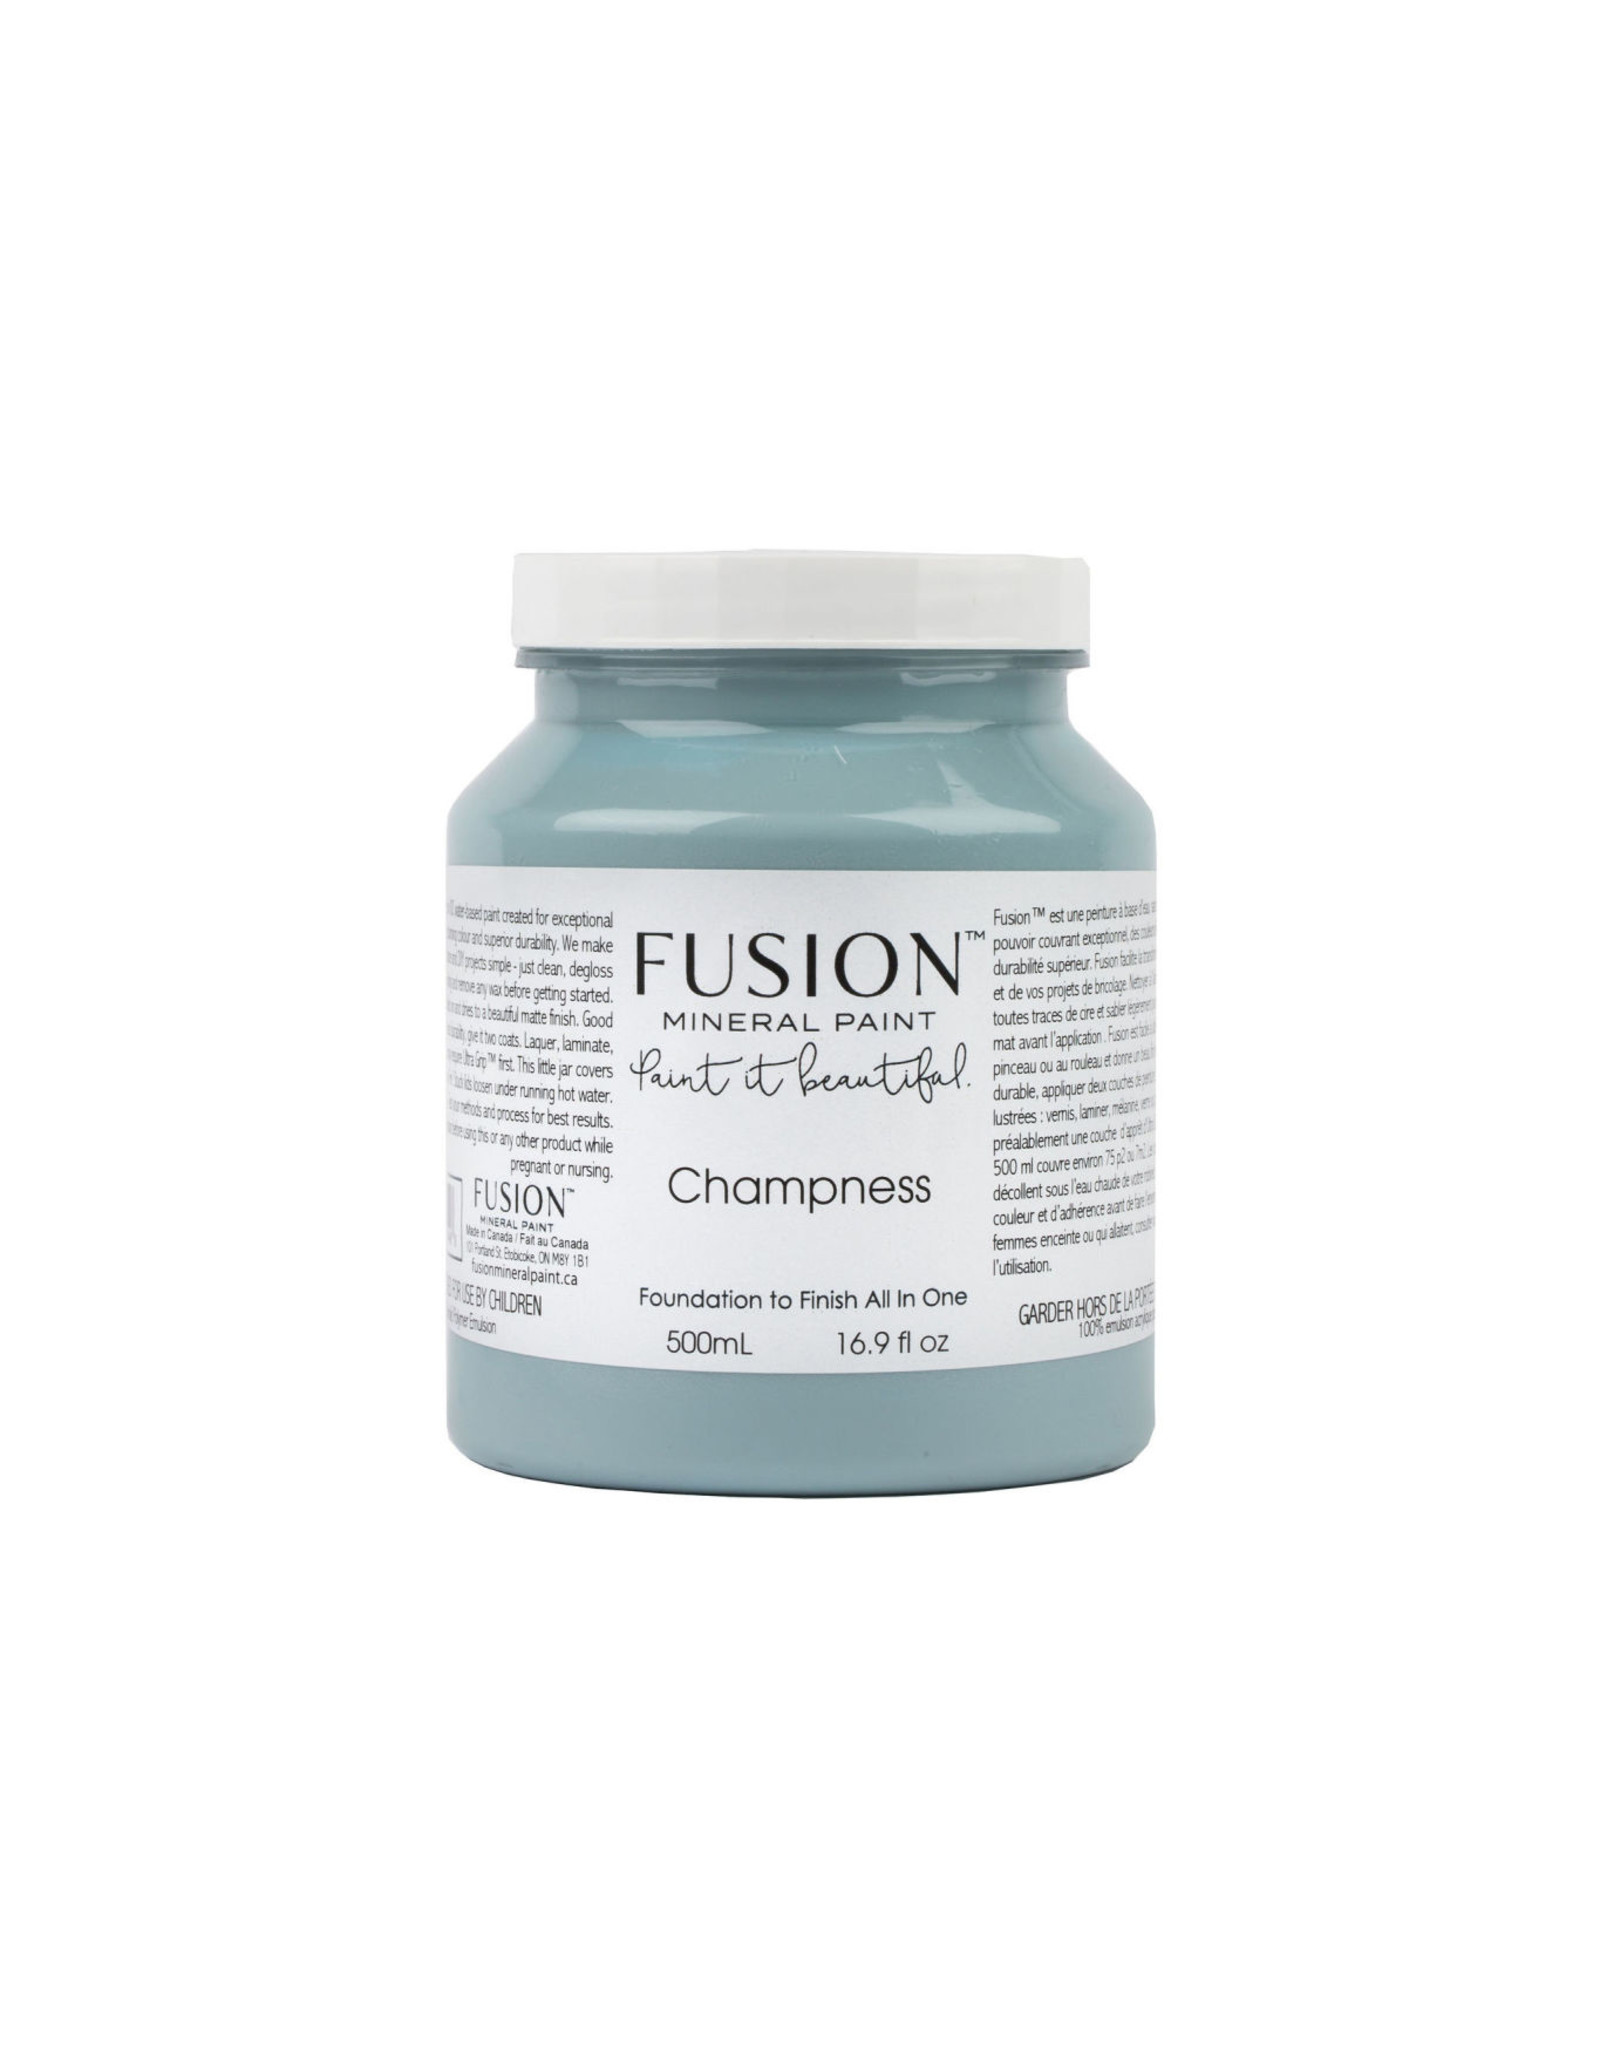 Fusion Mineral Paint Fusion Mineral Paint - Champness 500ml